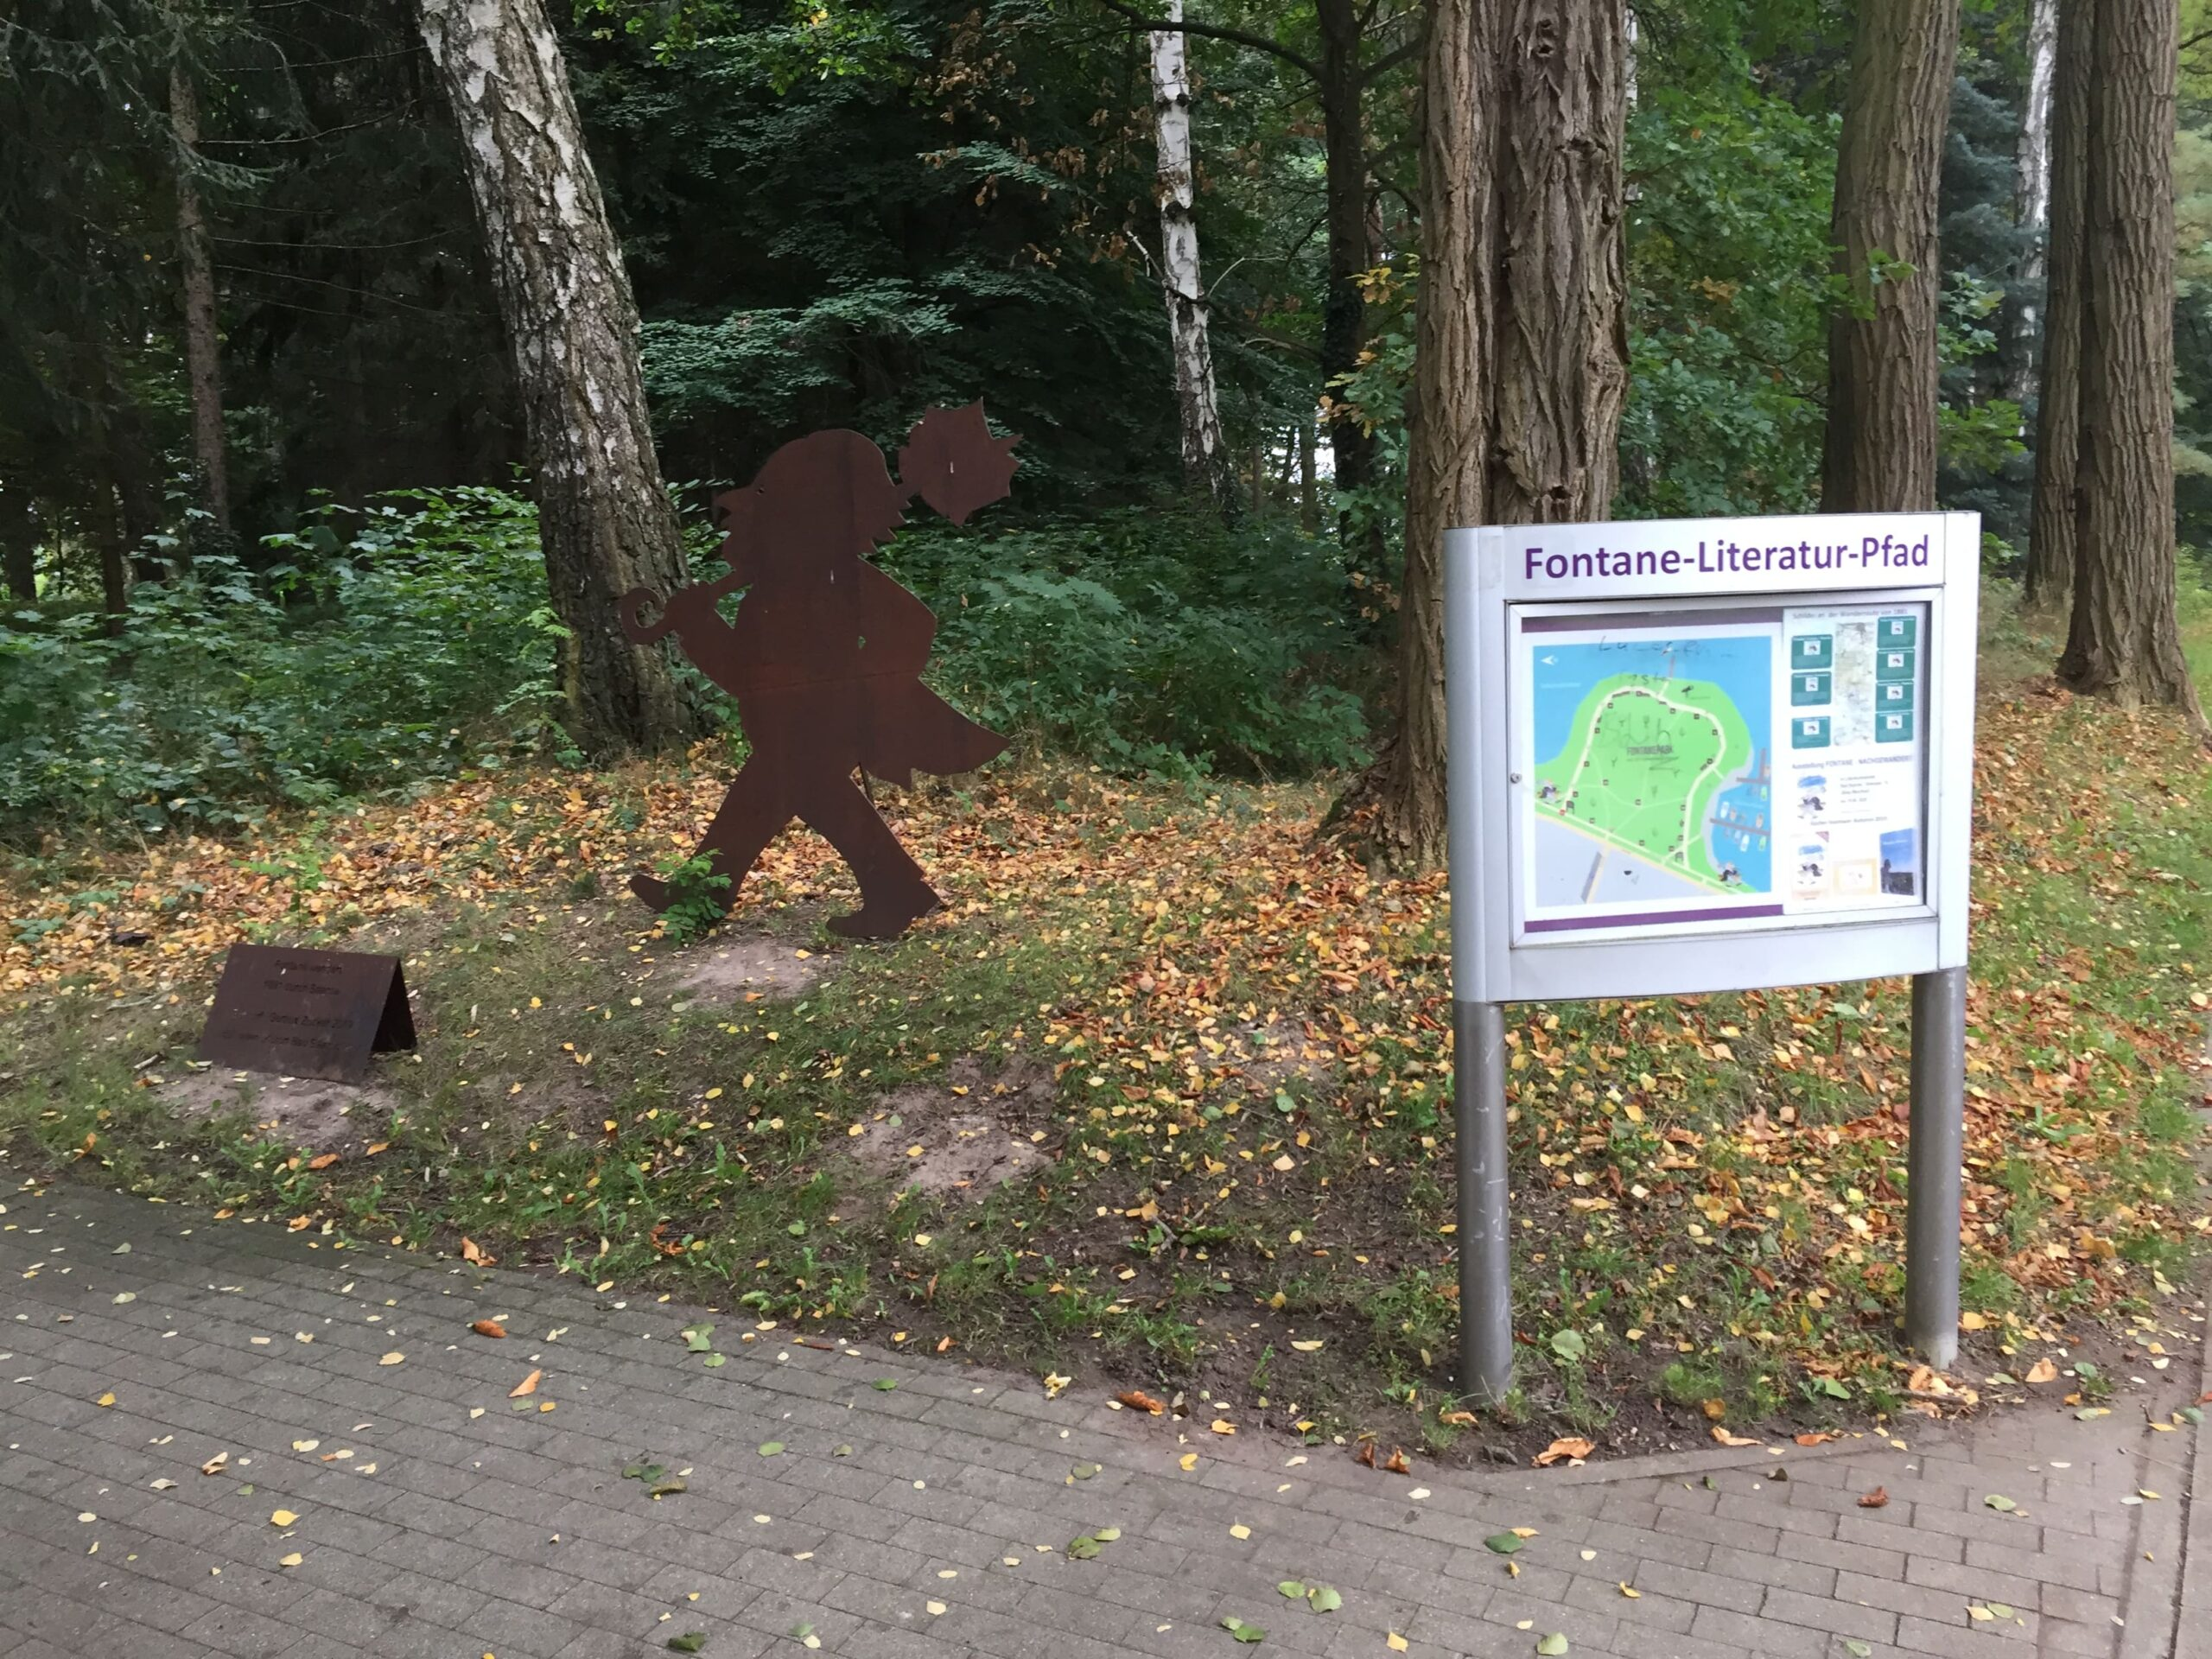 Fontaneweg Literaturpfad Bad Saaorw